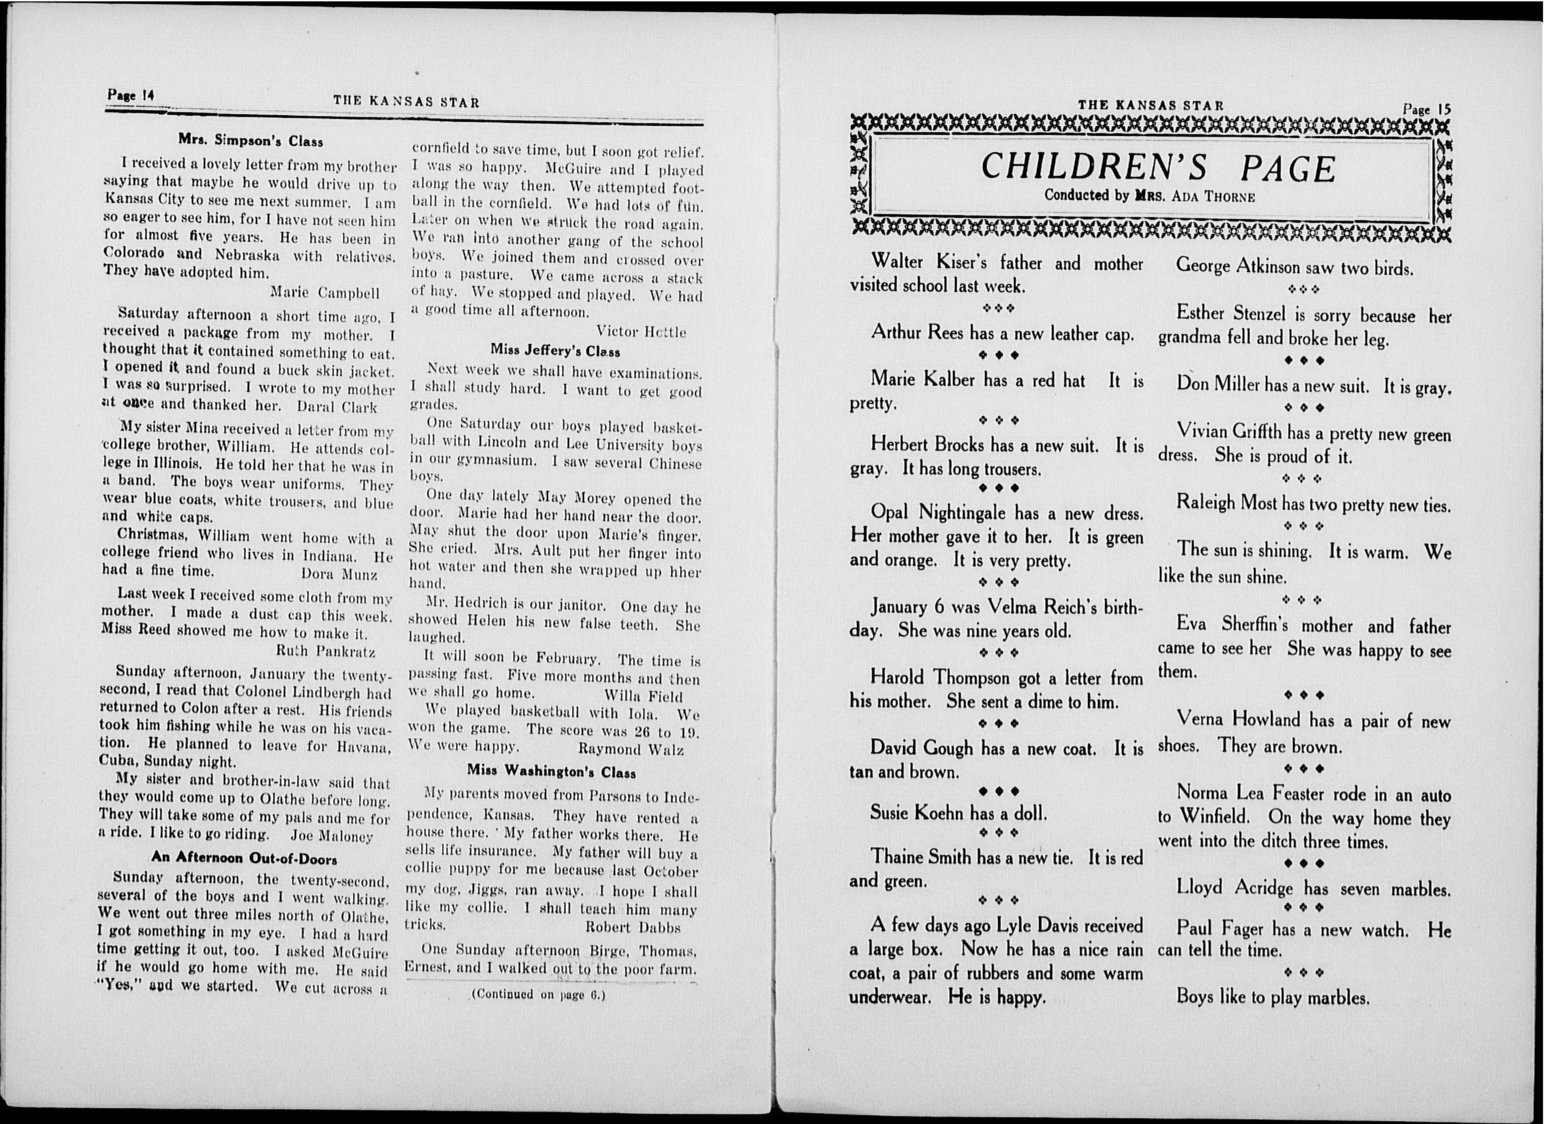 The Kansas Star, volume 51, number 6 - 14-15